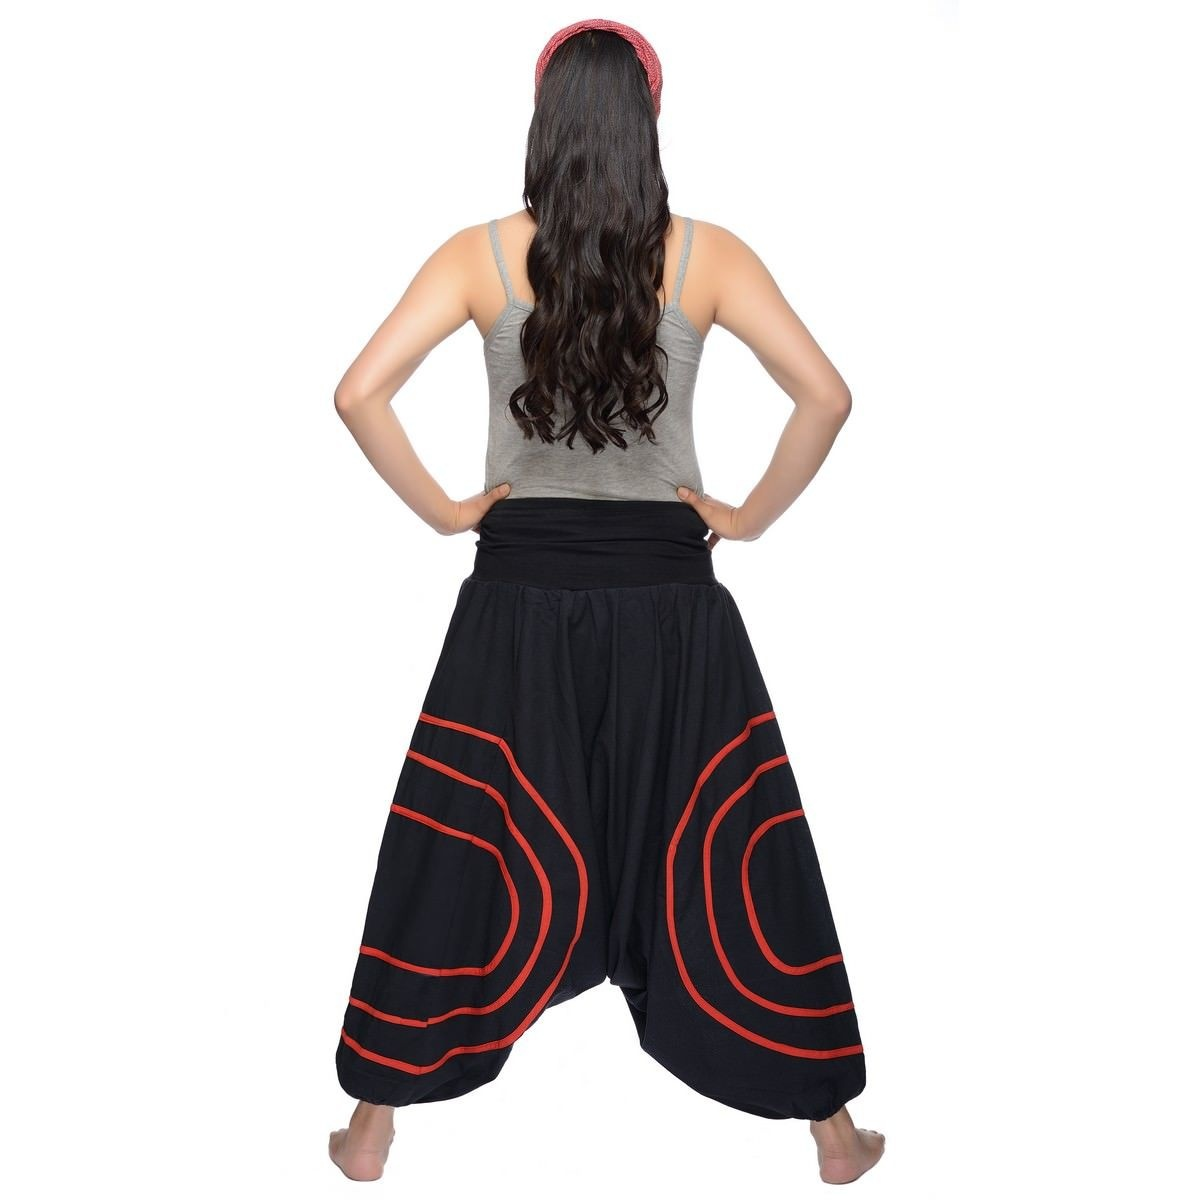 Harén pantalones harem Pantalones harem Pantalones Yoga Goa Sarouel Aladin  ocio bombacha damas CercleS db7d82e91acf